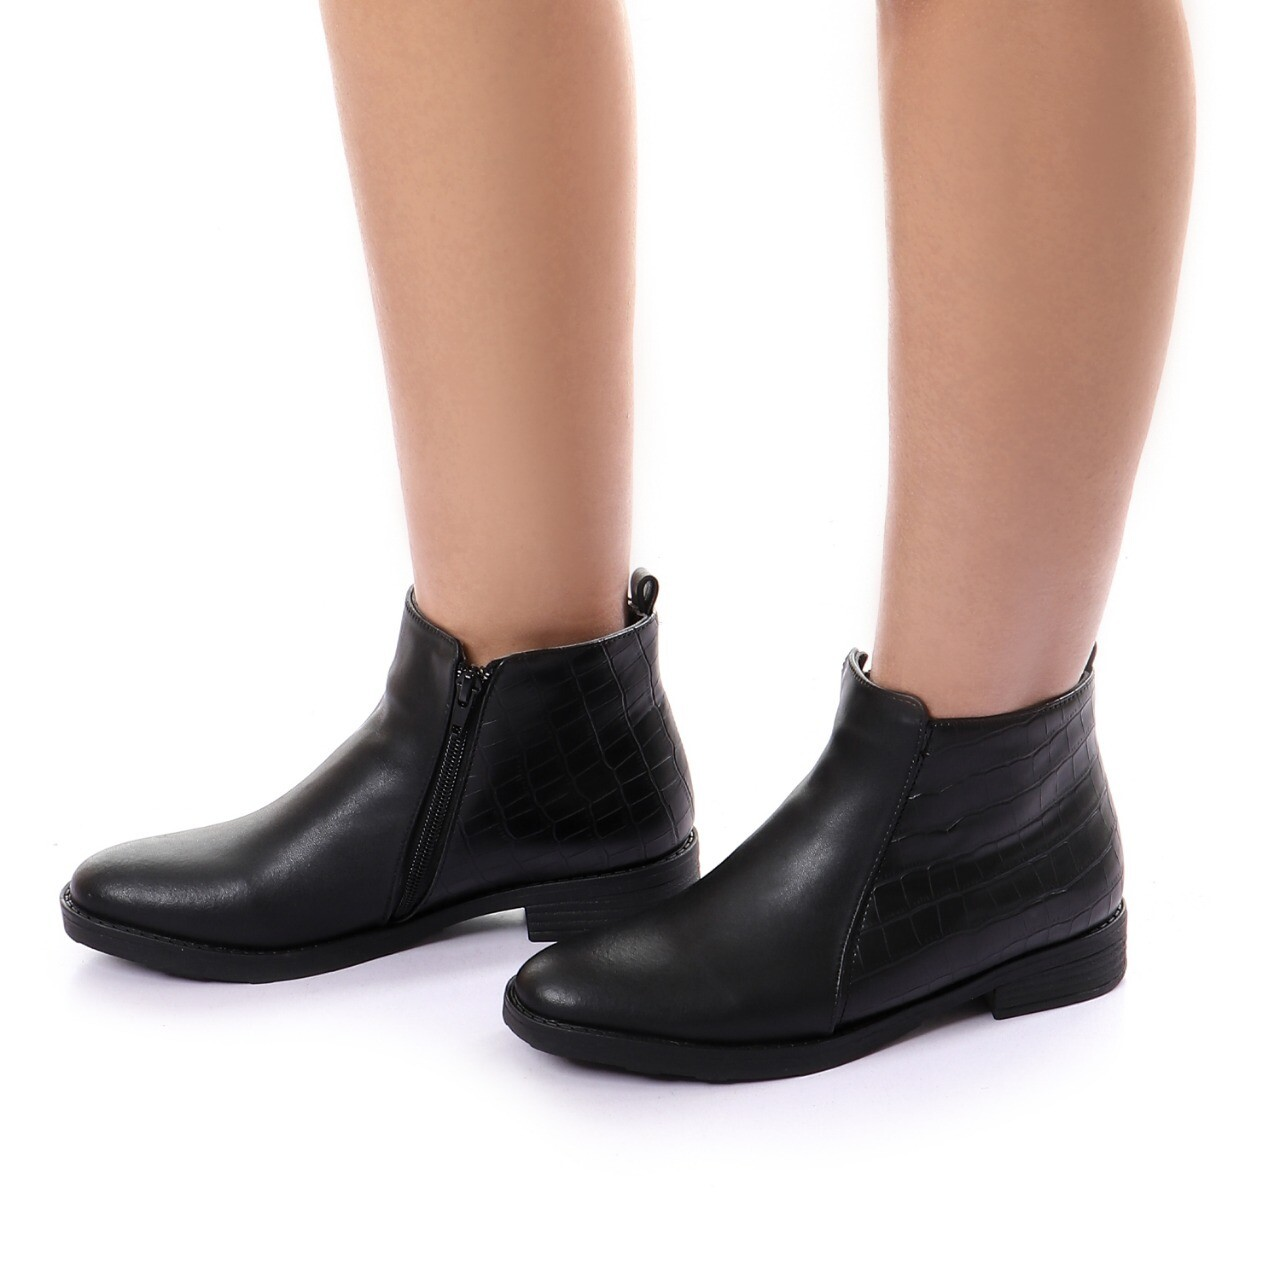 3761 Half Boot - Black